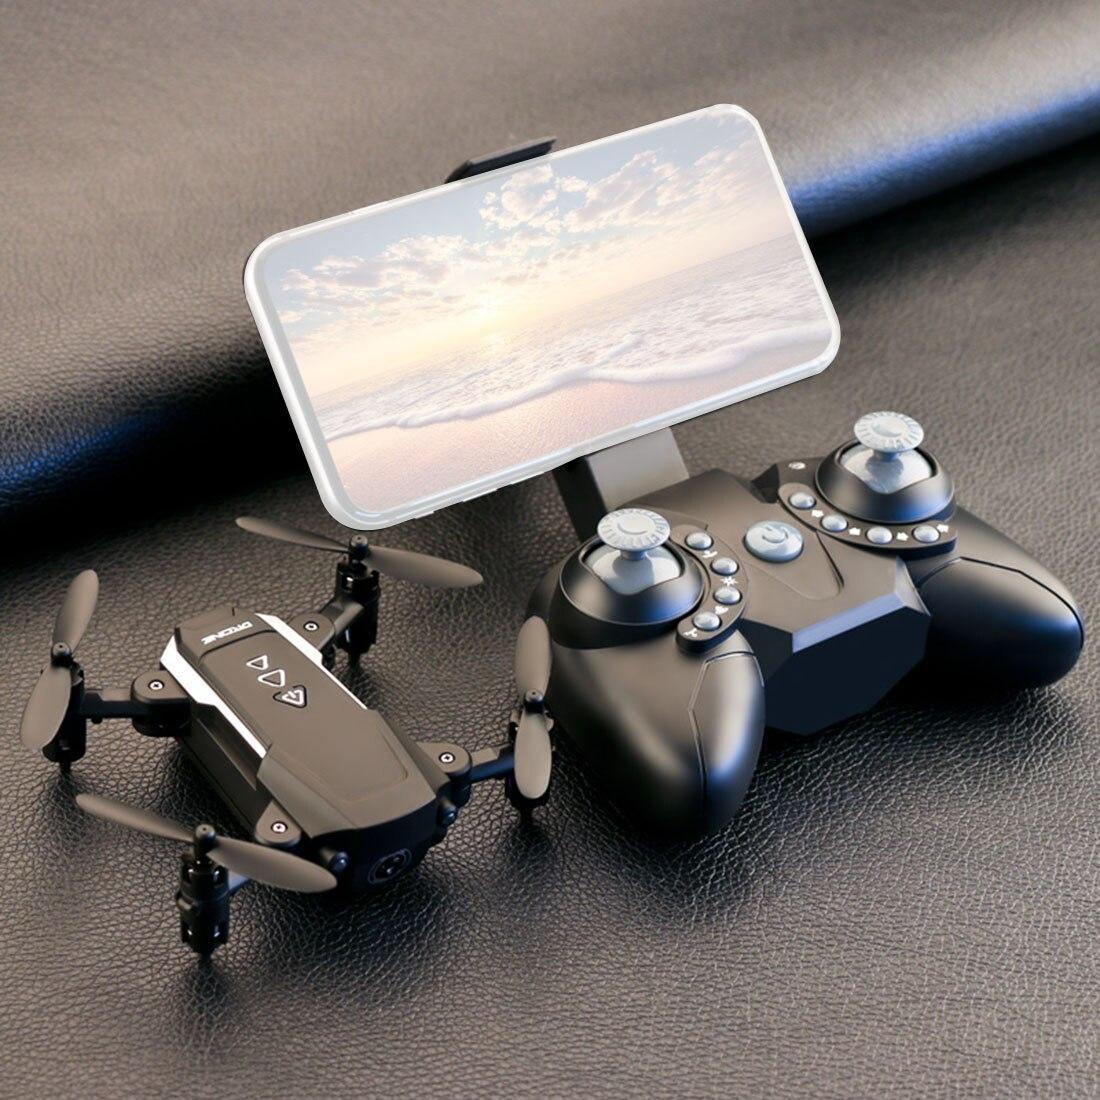 KK8 складной мини-Дрон Радиоуправляемый квадрокоптер HD 1080P камера Wifi FPV Дрон удержание высоты радиоуправляемый самолет игрушки 15 минут время ...